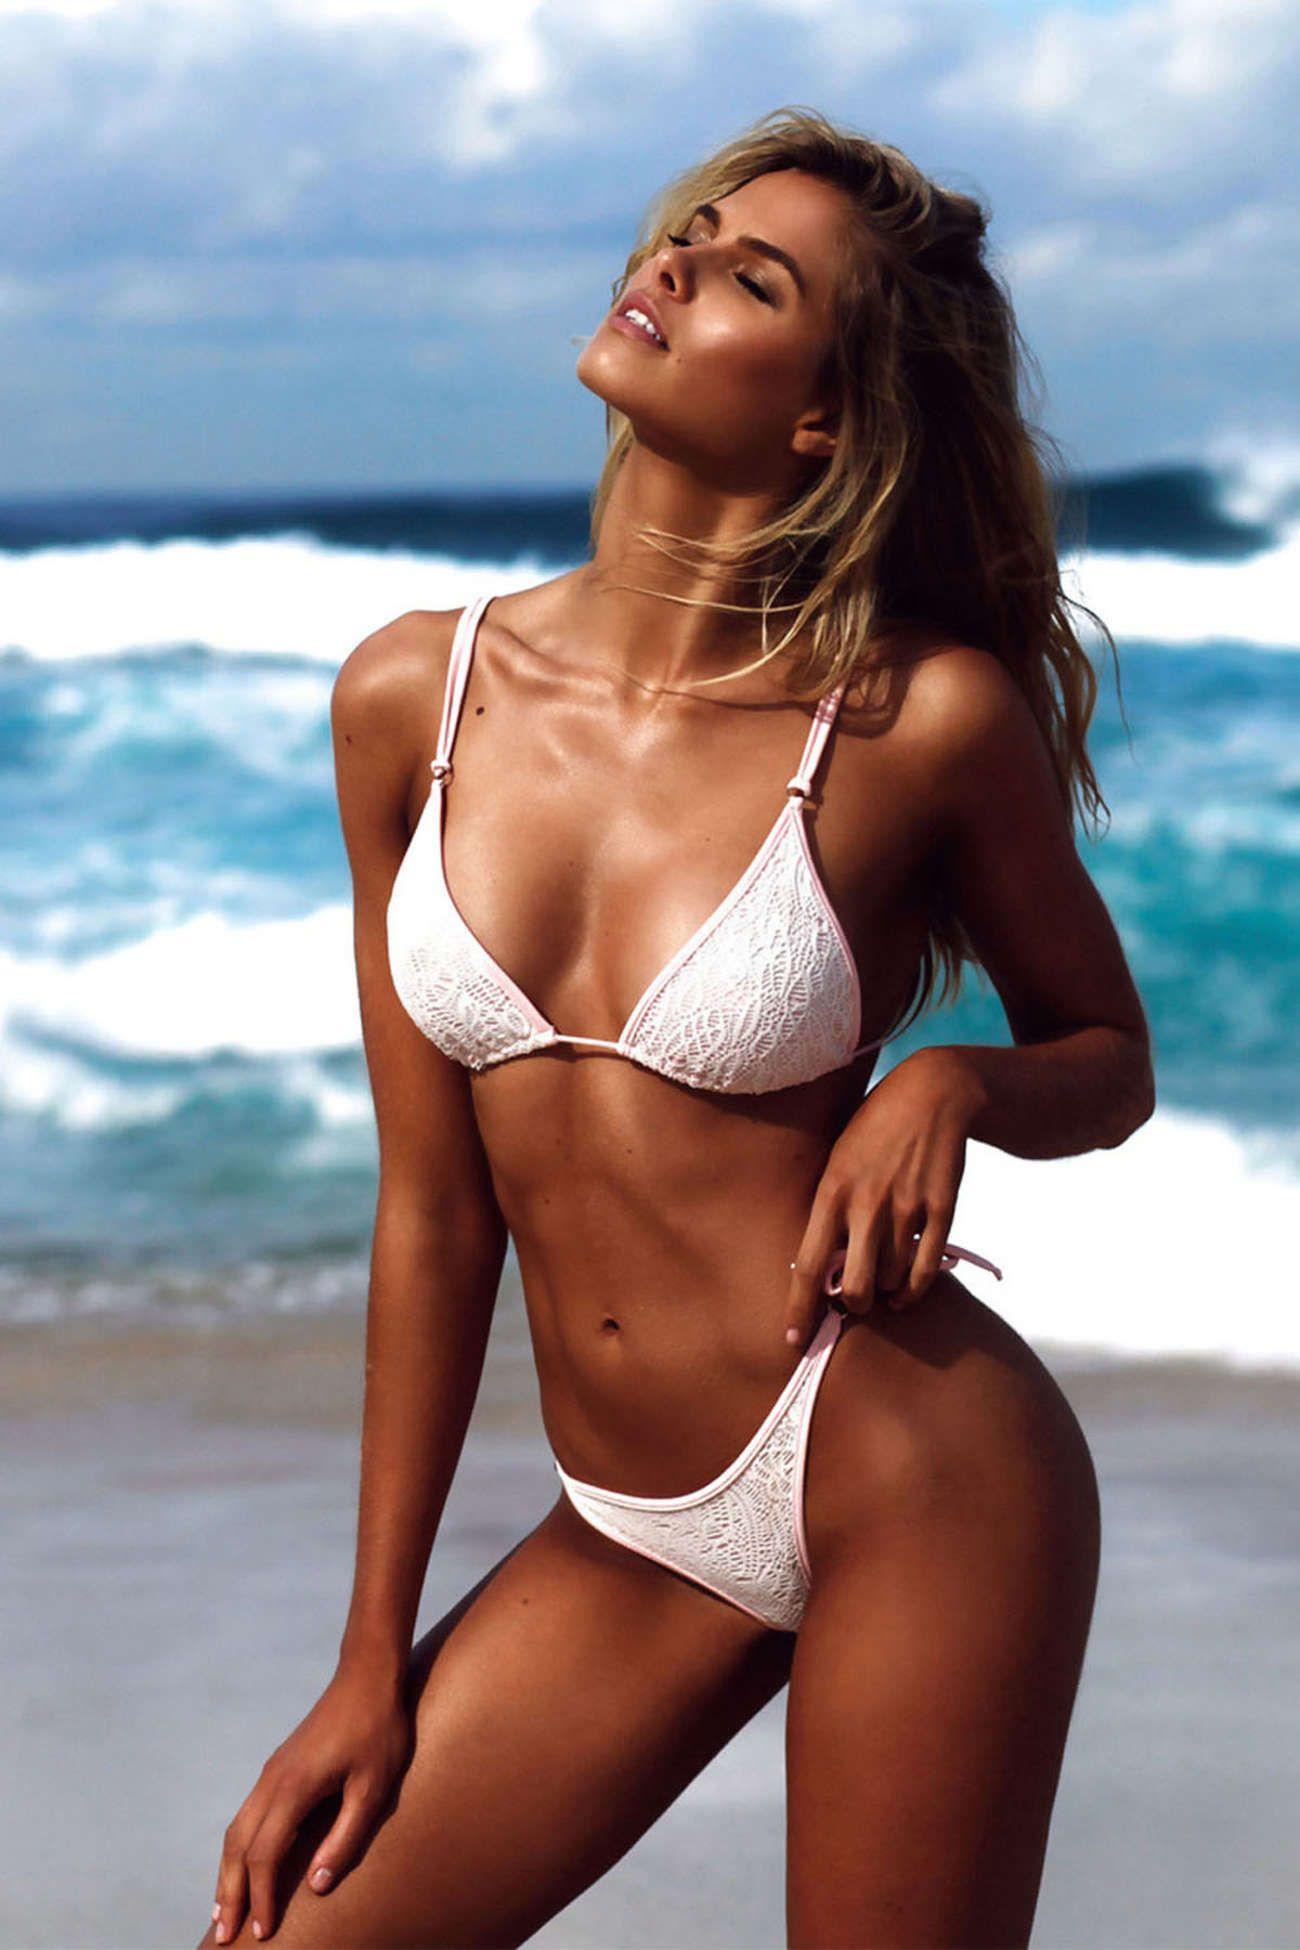 Hot Natalie Jayne Roser nude photos 2019